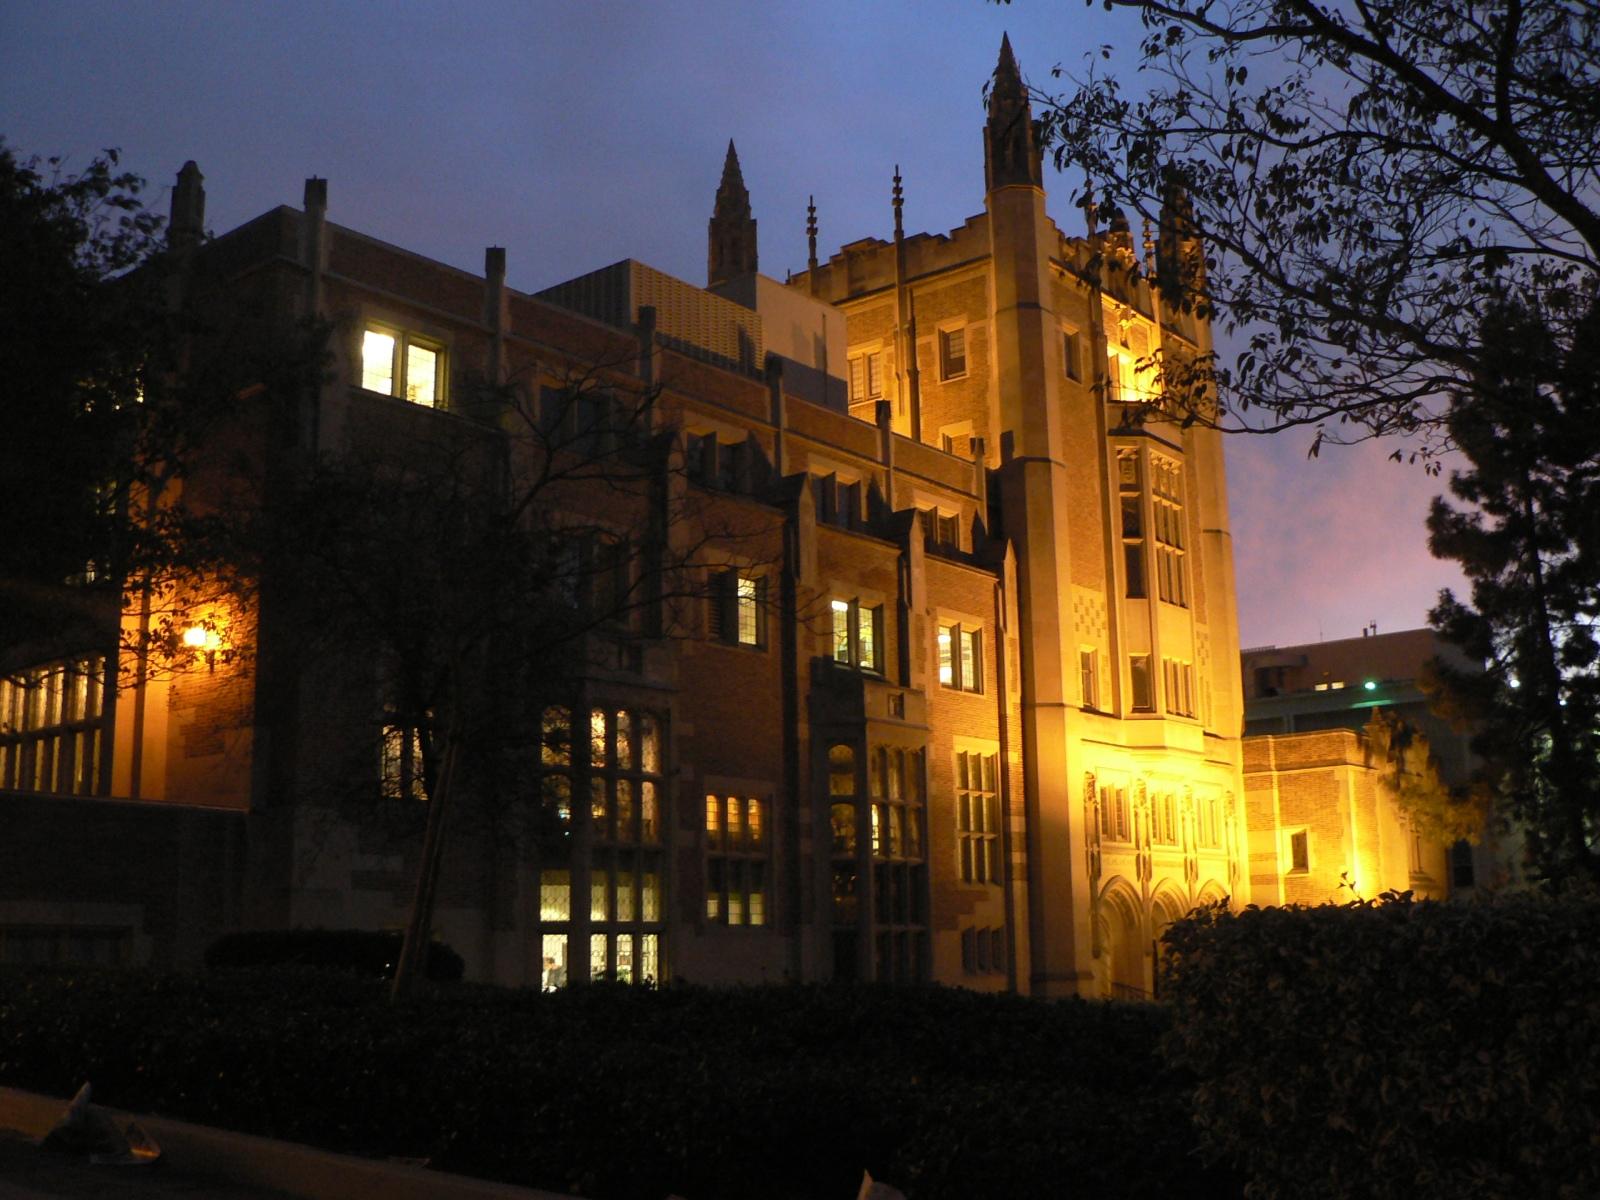 ucla campus at night - photo #14